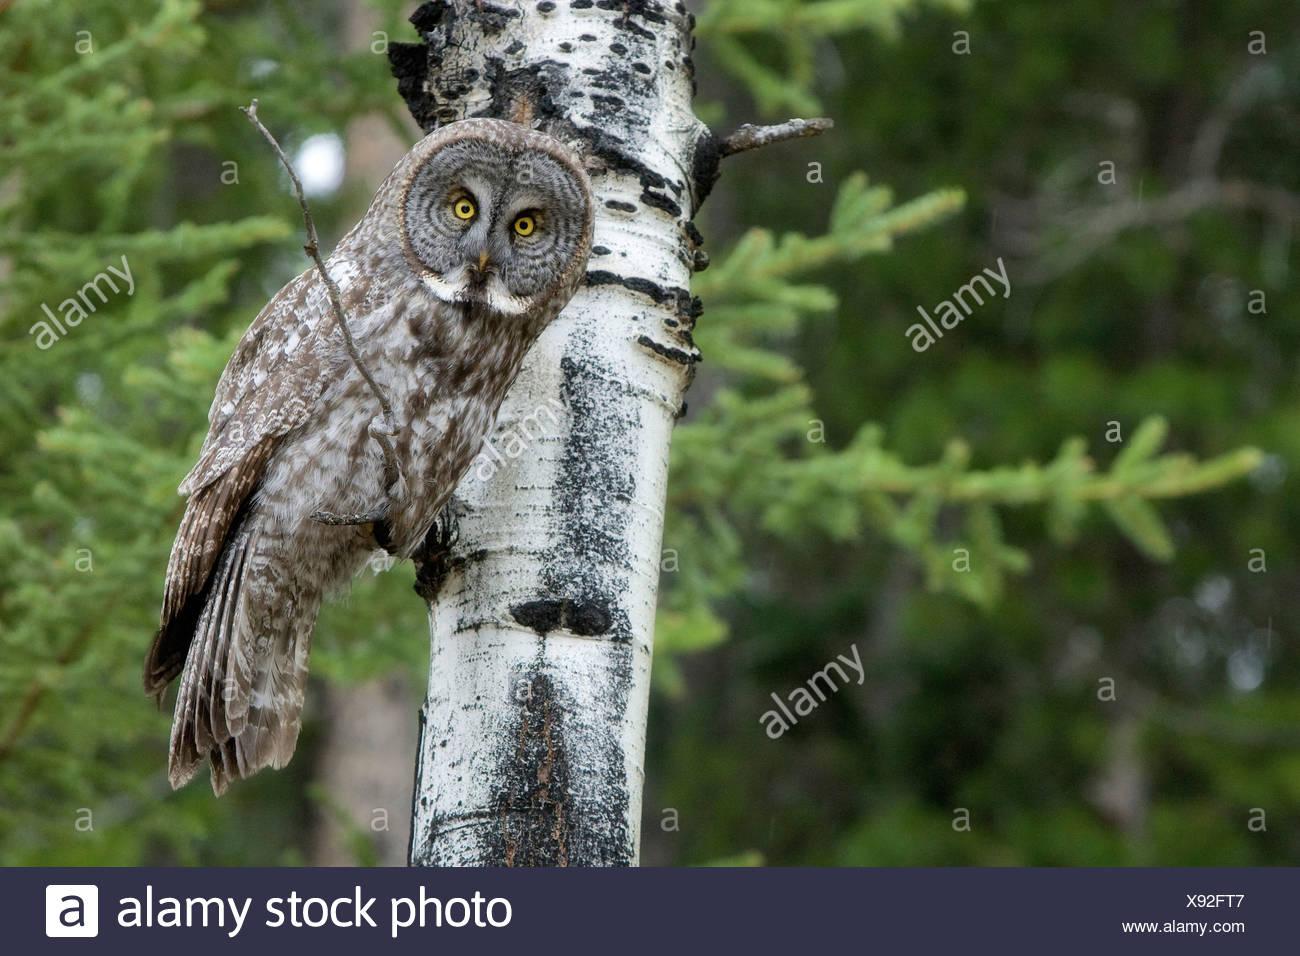 Great Grey Owl perched limb poplar tree Banff - Stock Image